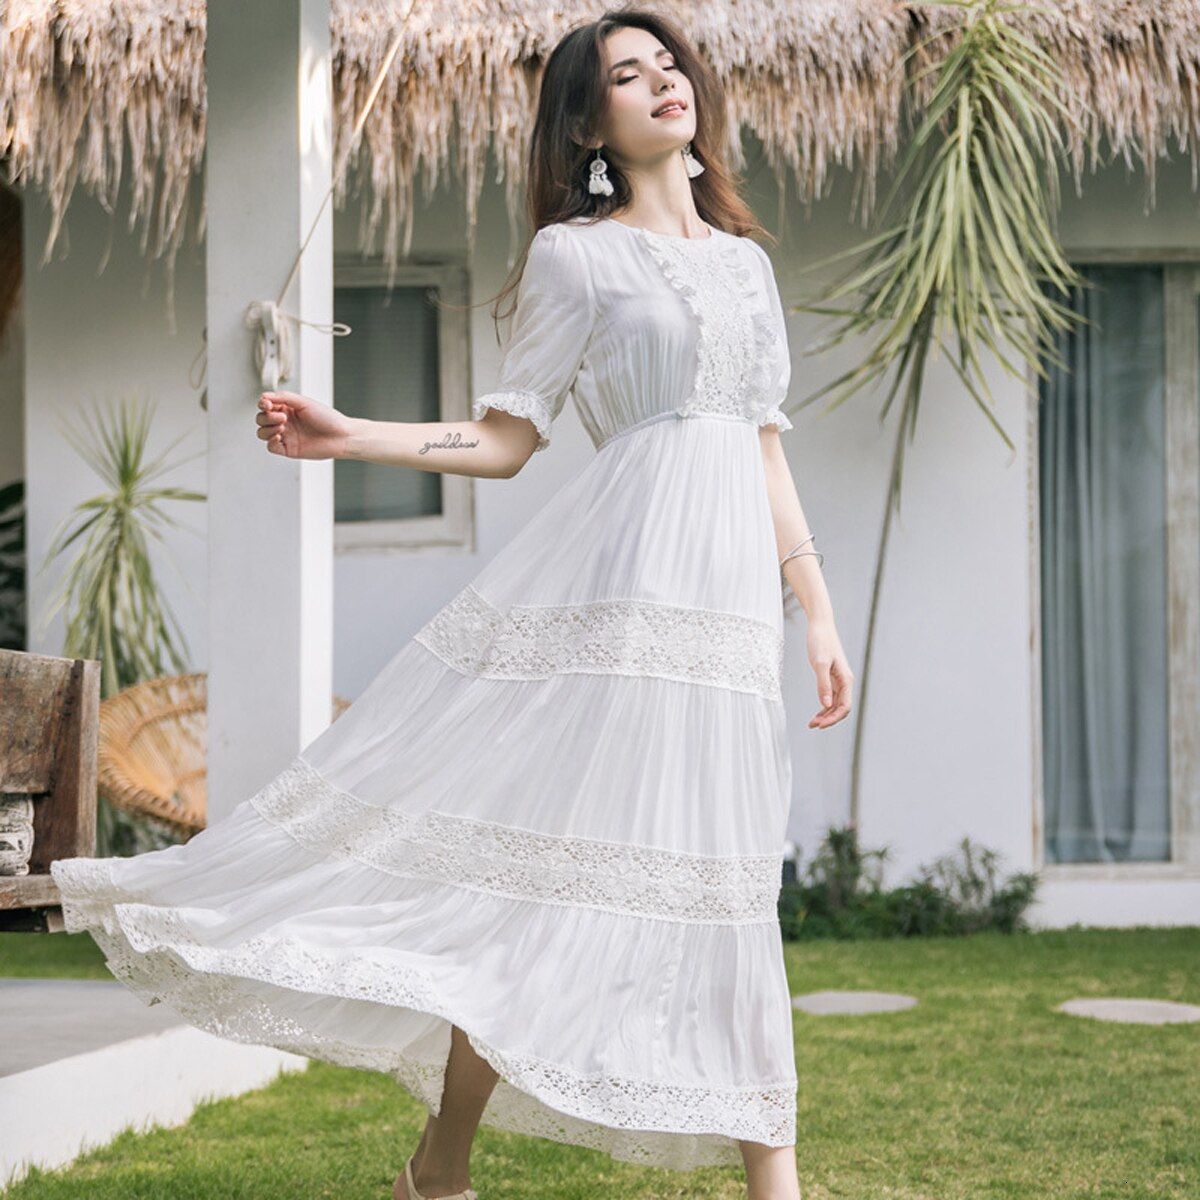 New Bohemian Hippie Big Swing Holiday Beach Dress O-Neck Half Sleeve Spring Summer Dresses Women White Patchwork Lace Dress 3